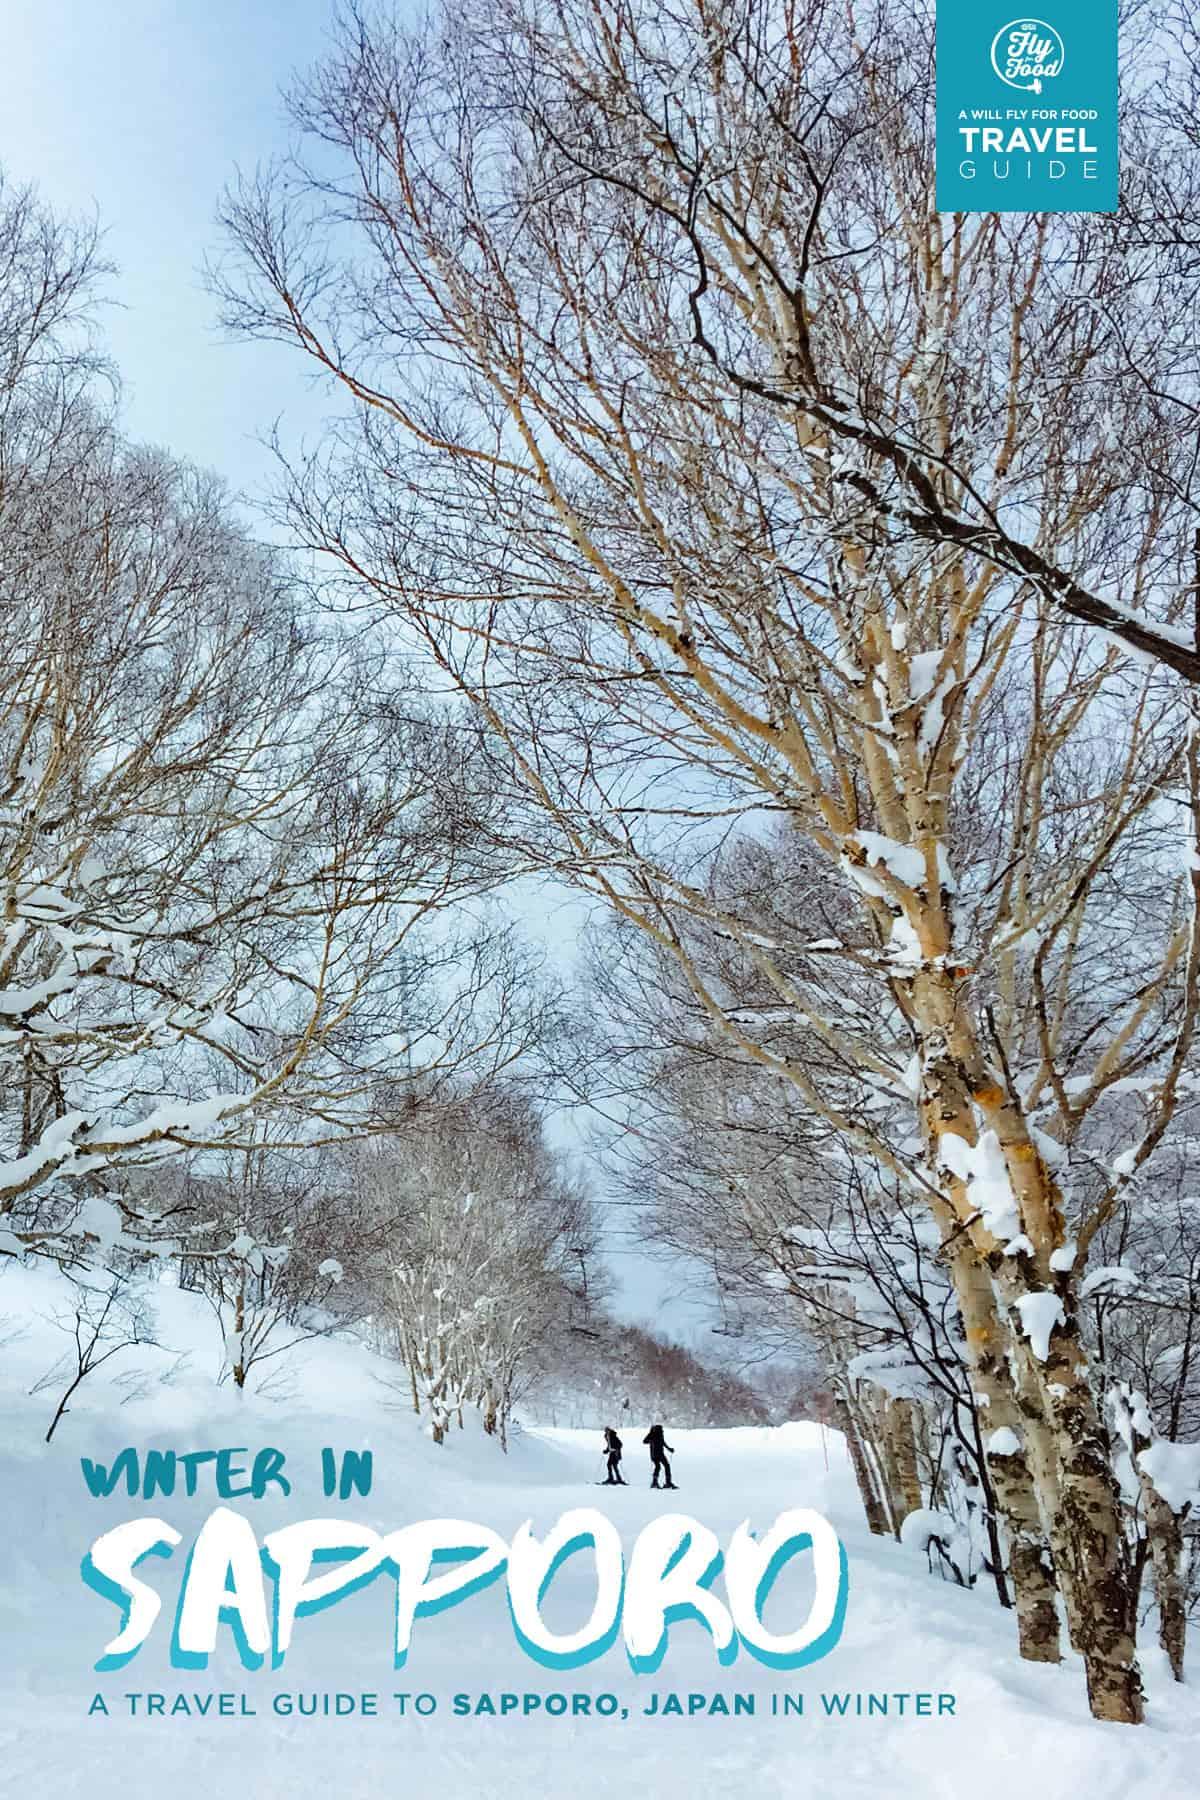 Skiing in Sapporo